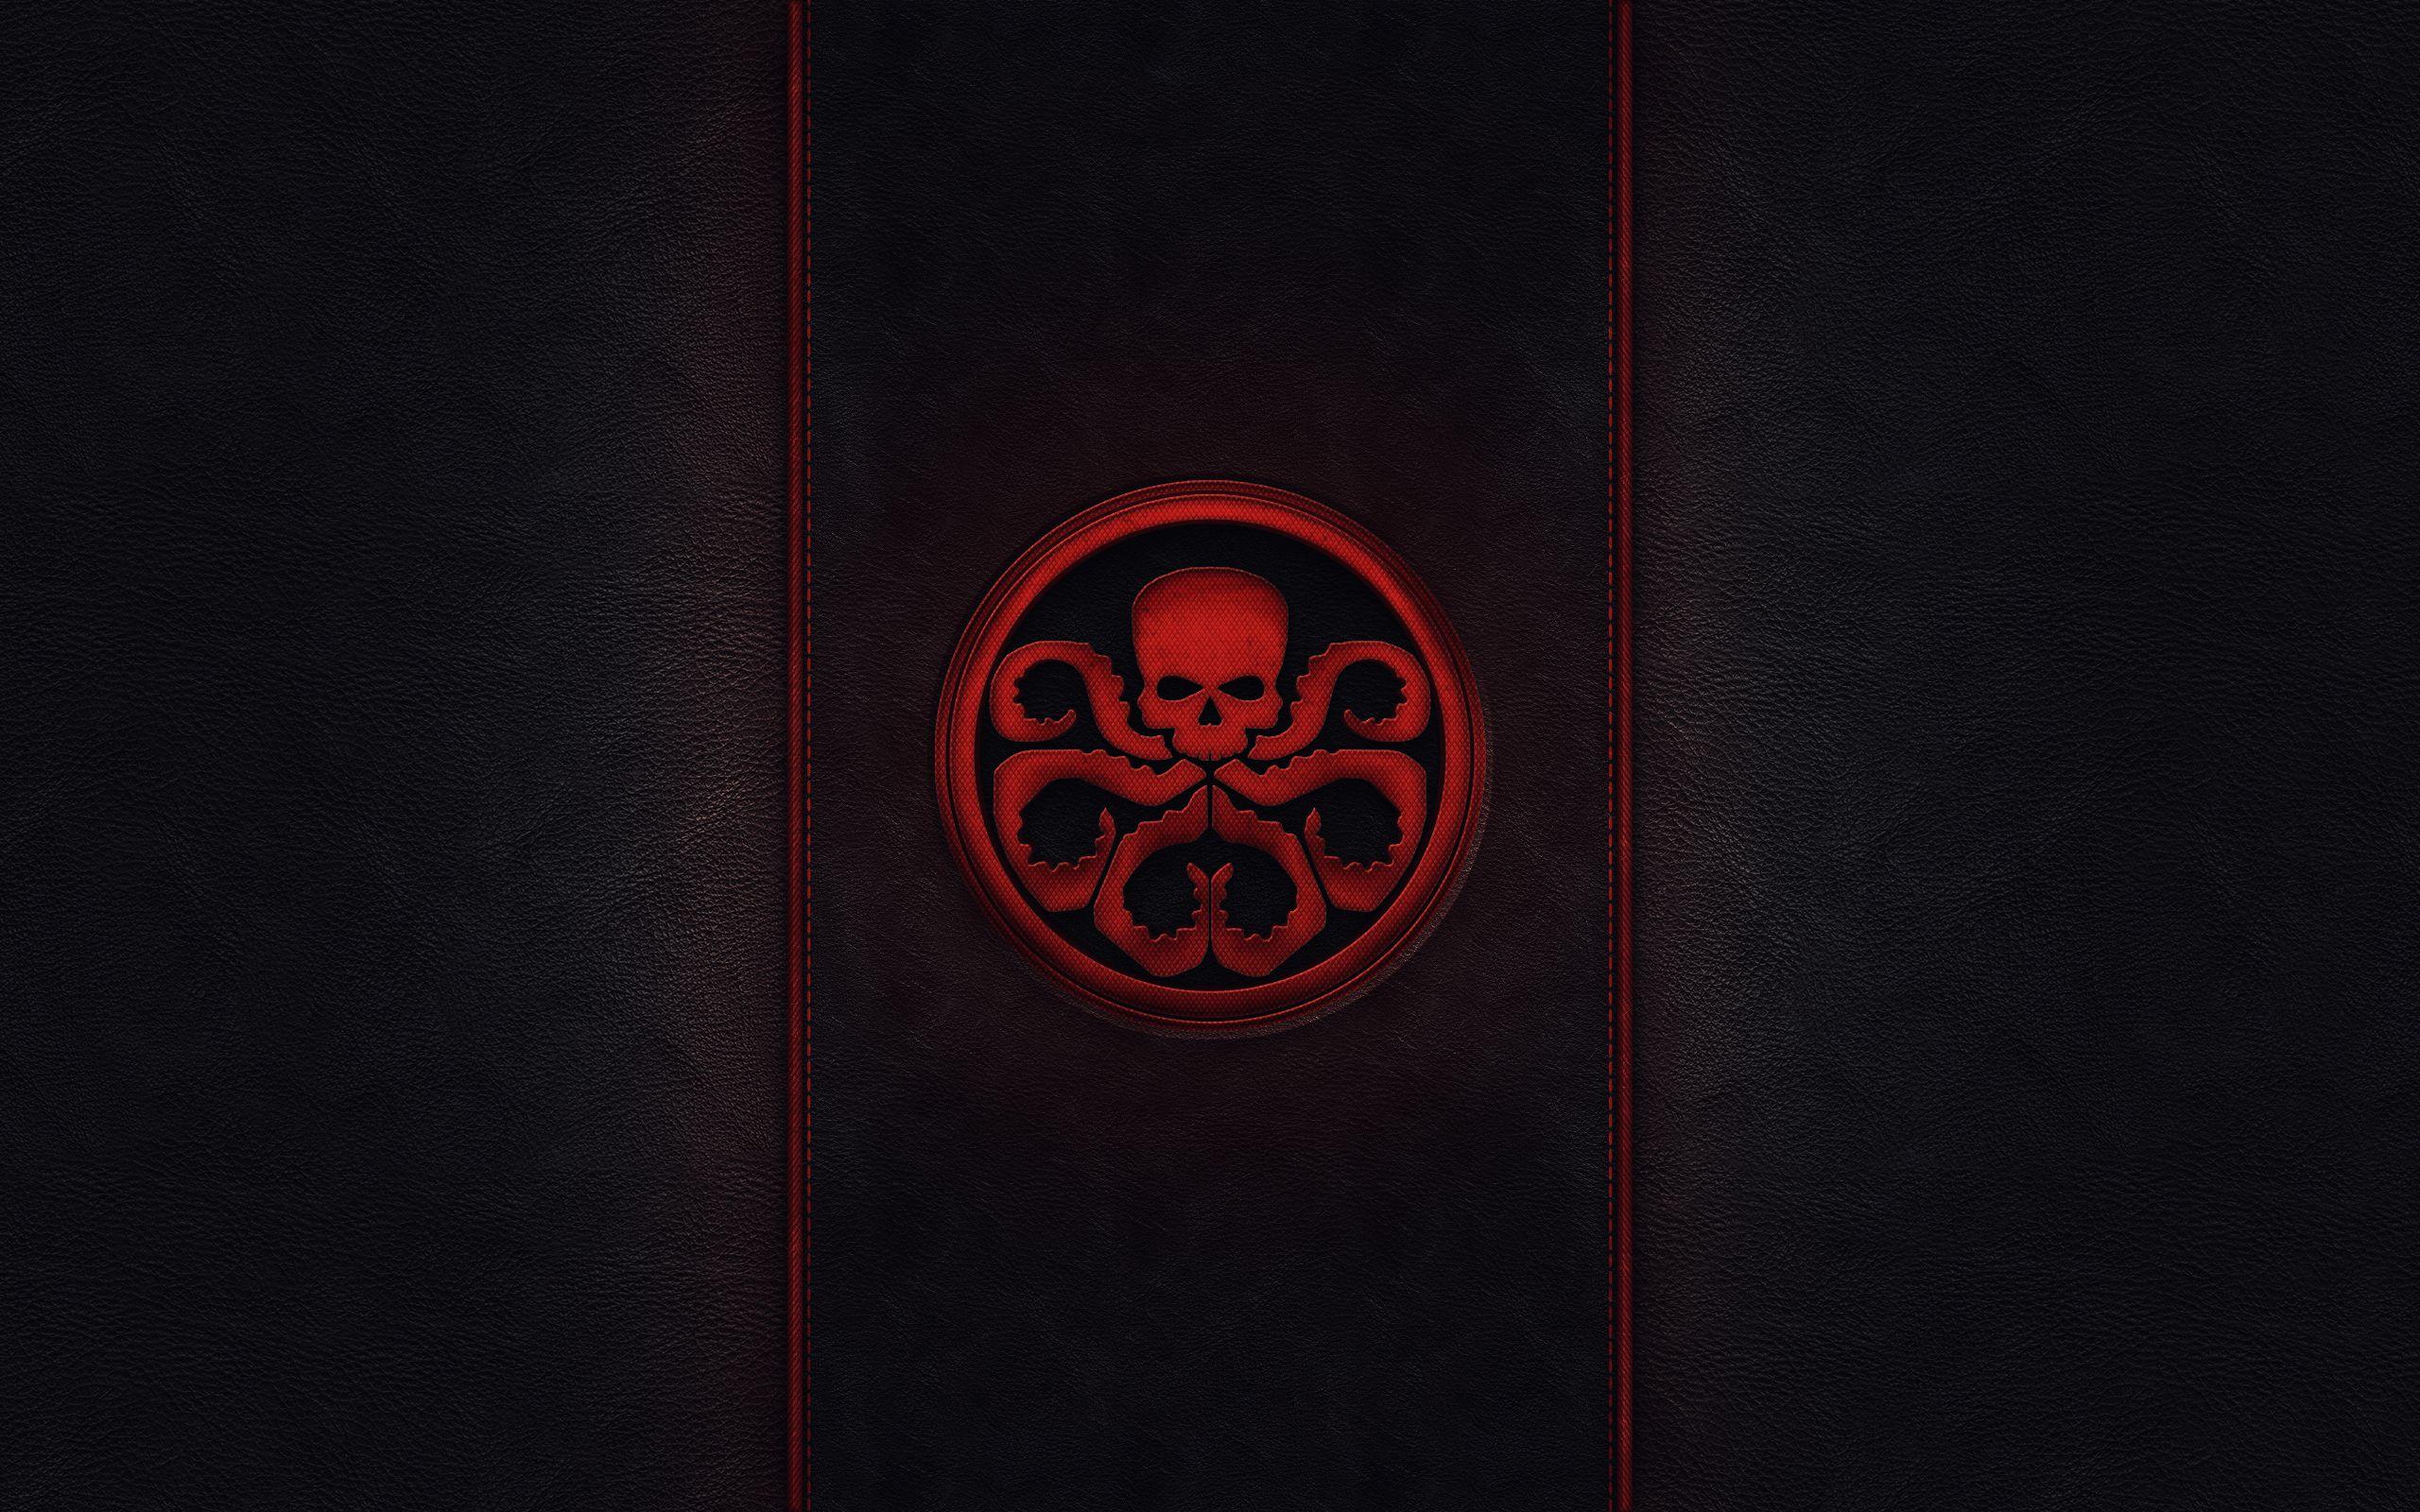 HD Wallpapers | HD Wallpapers | 8k wallpaper, Logos, Skull